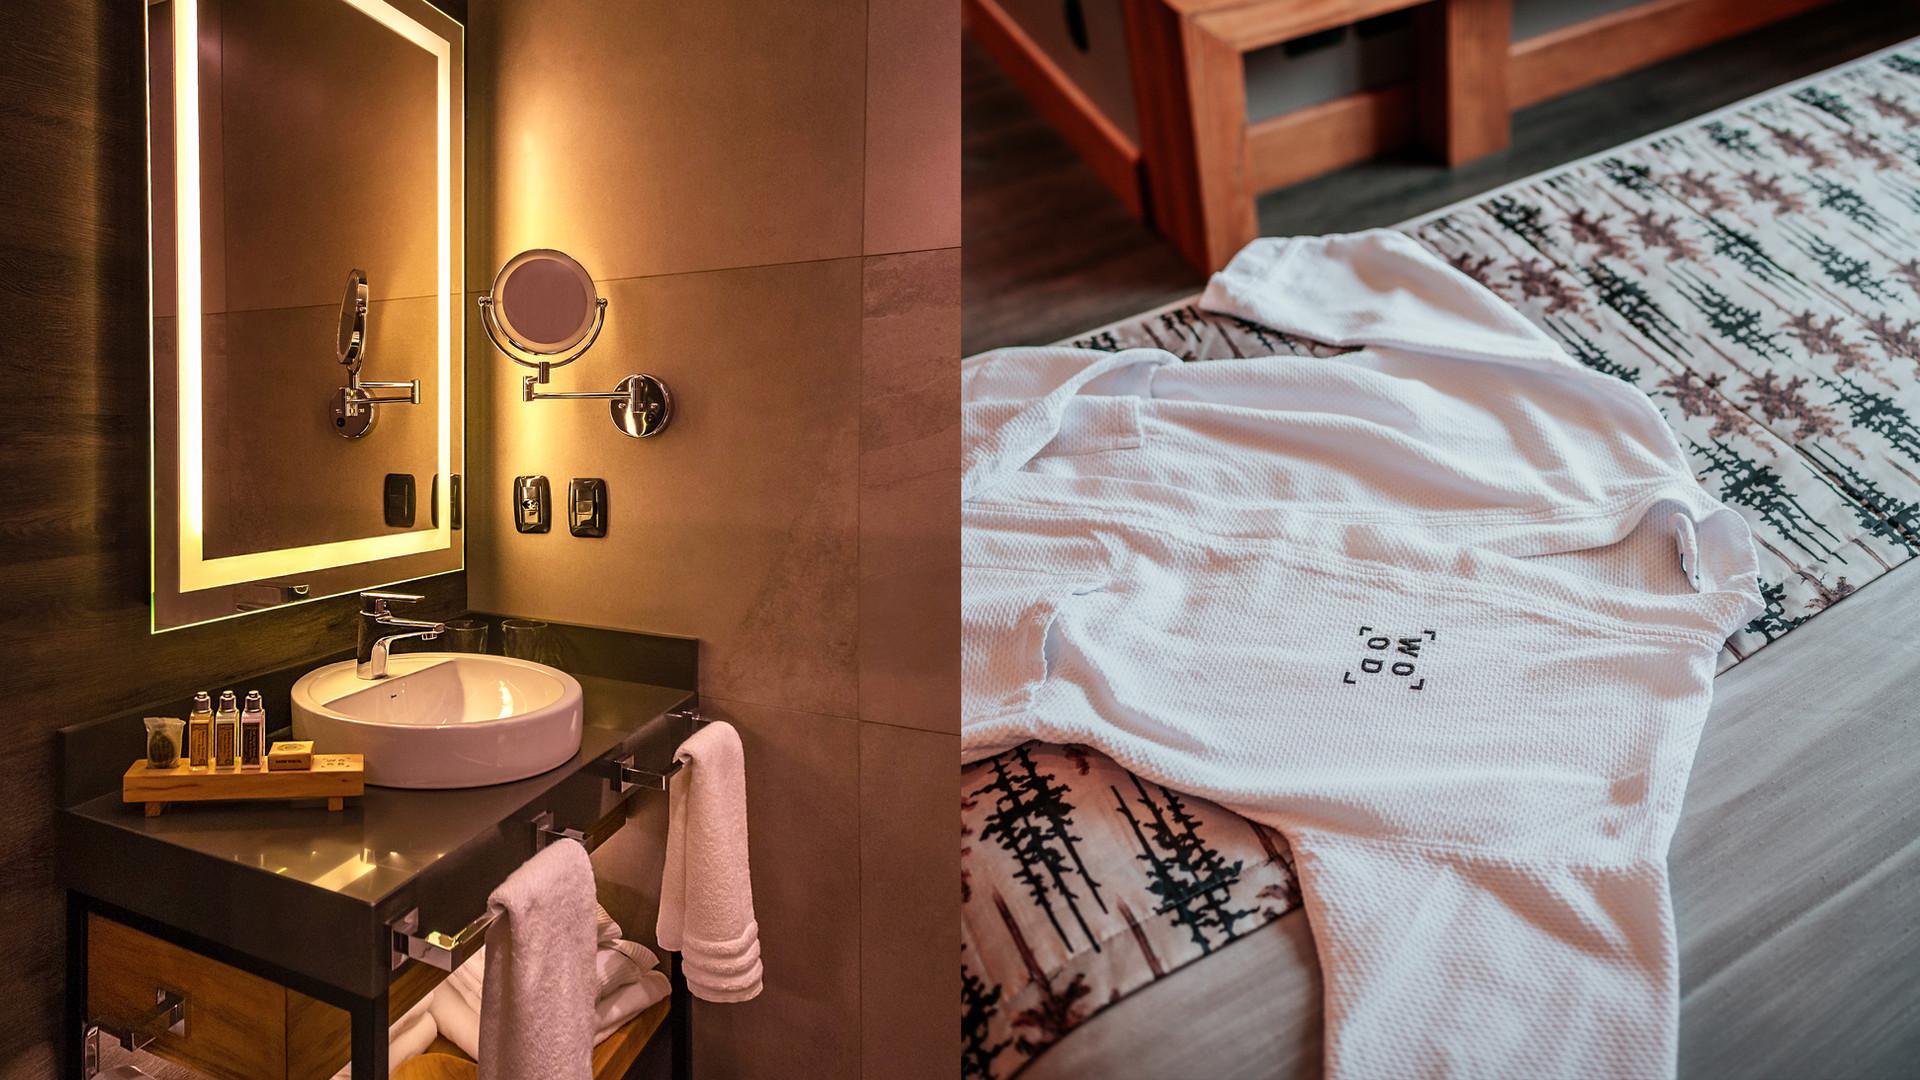 Cama Wood Room - Hotel Wood em Gramado